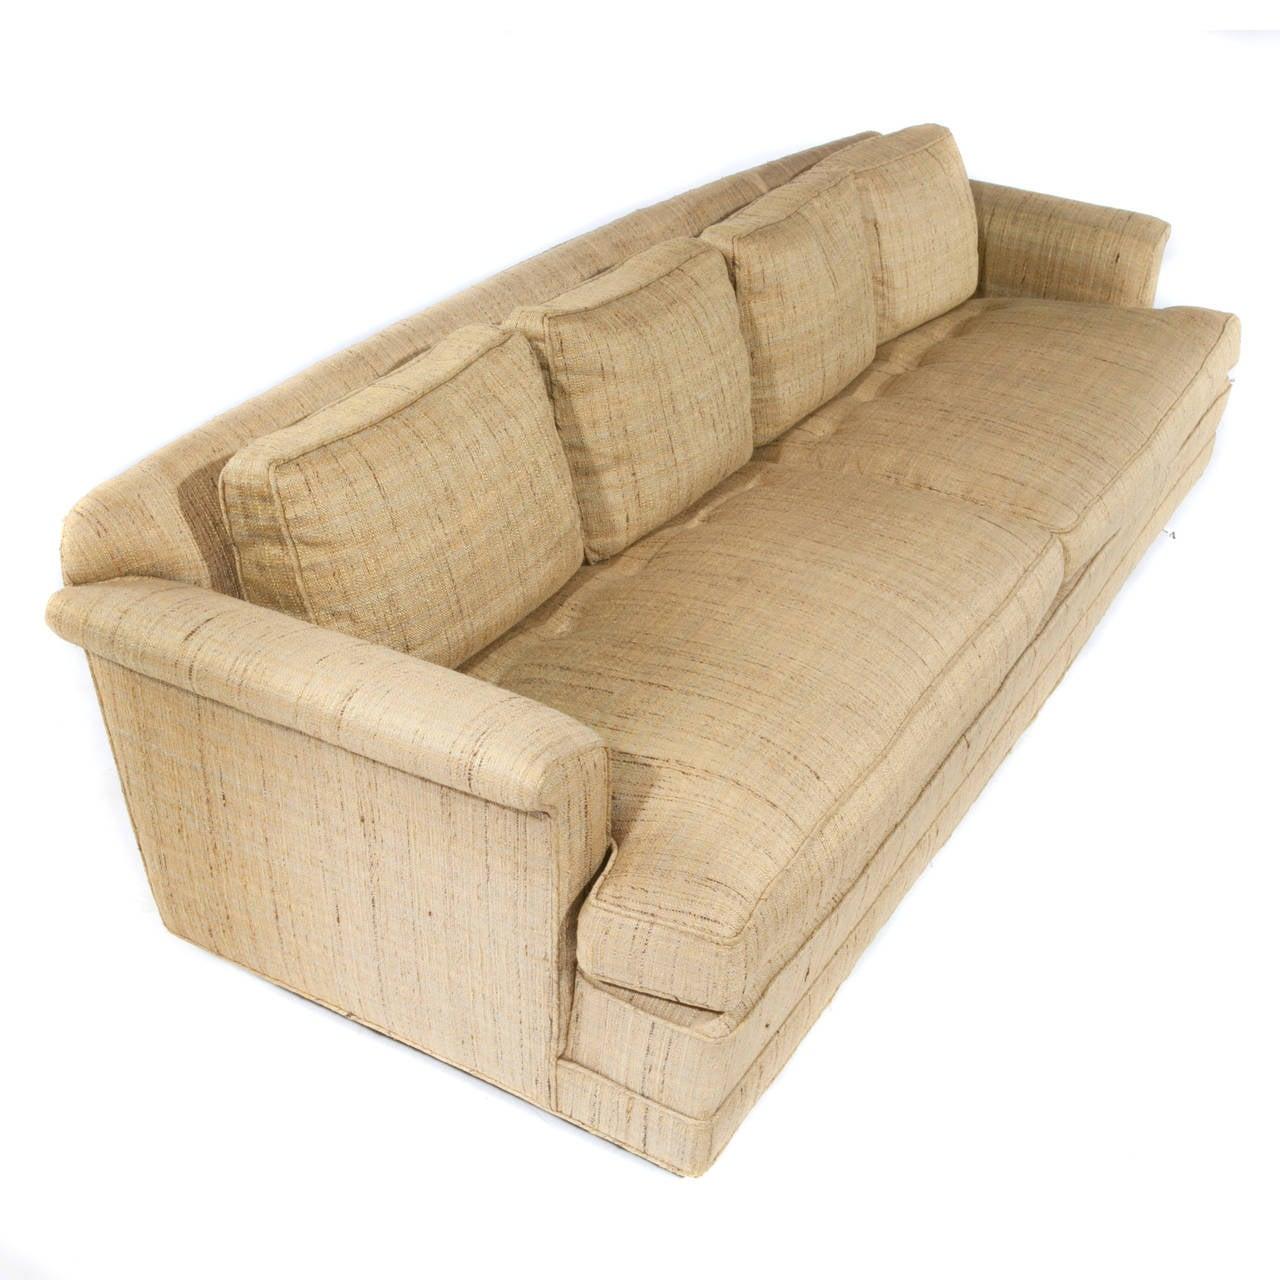 1950s Four-Seat Sofa by Edward Wormley for Dunbar 3